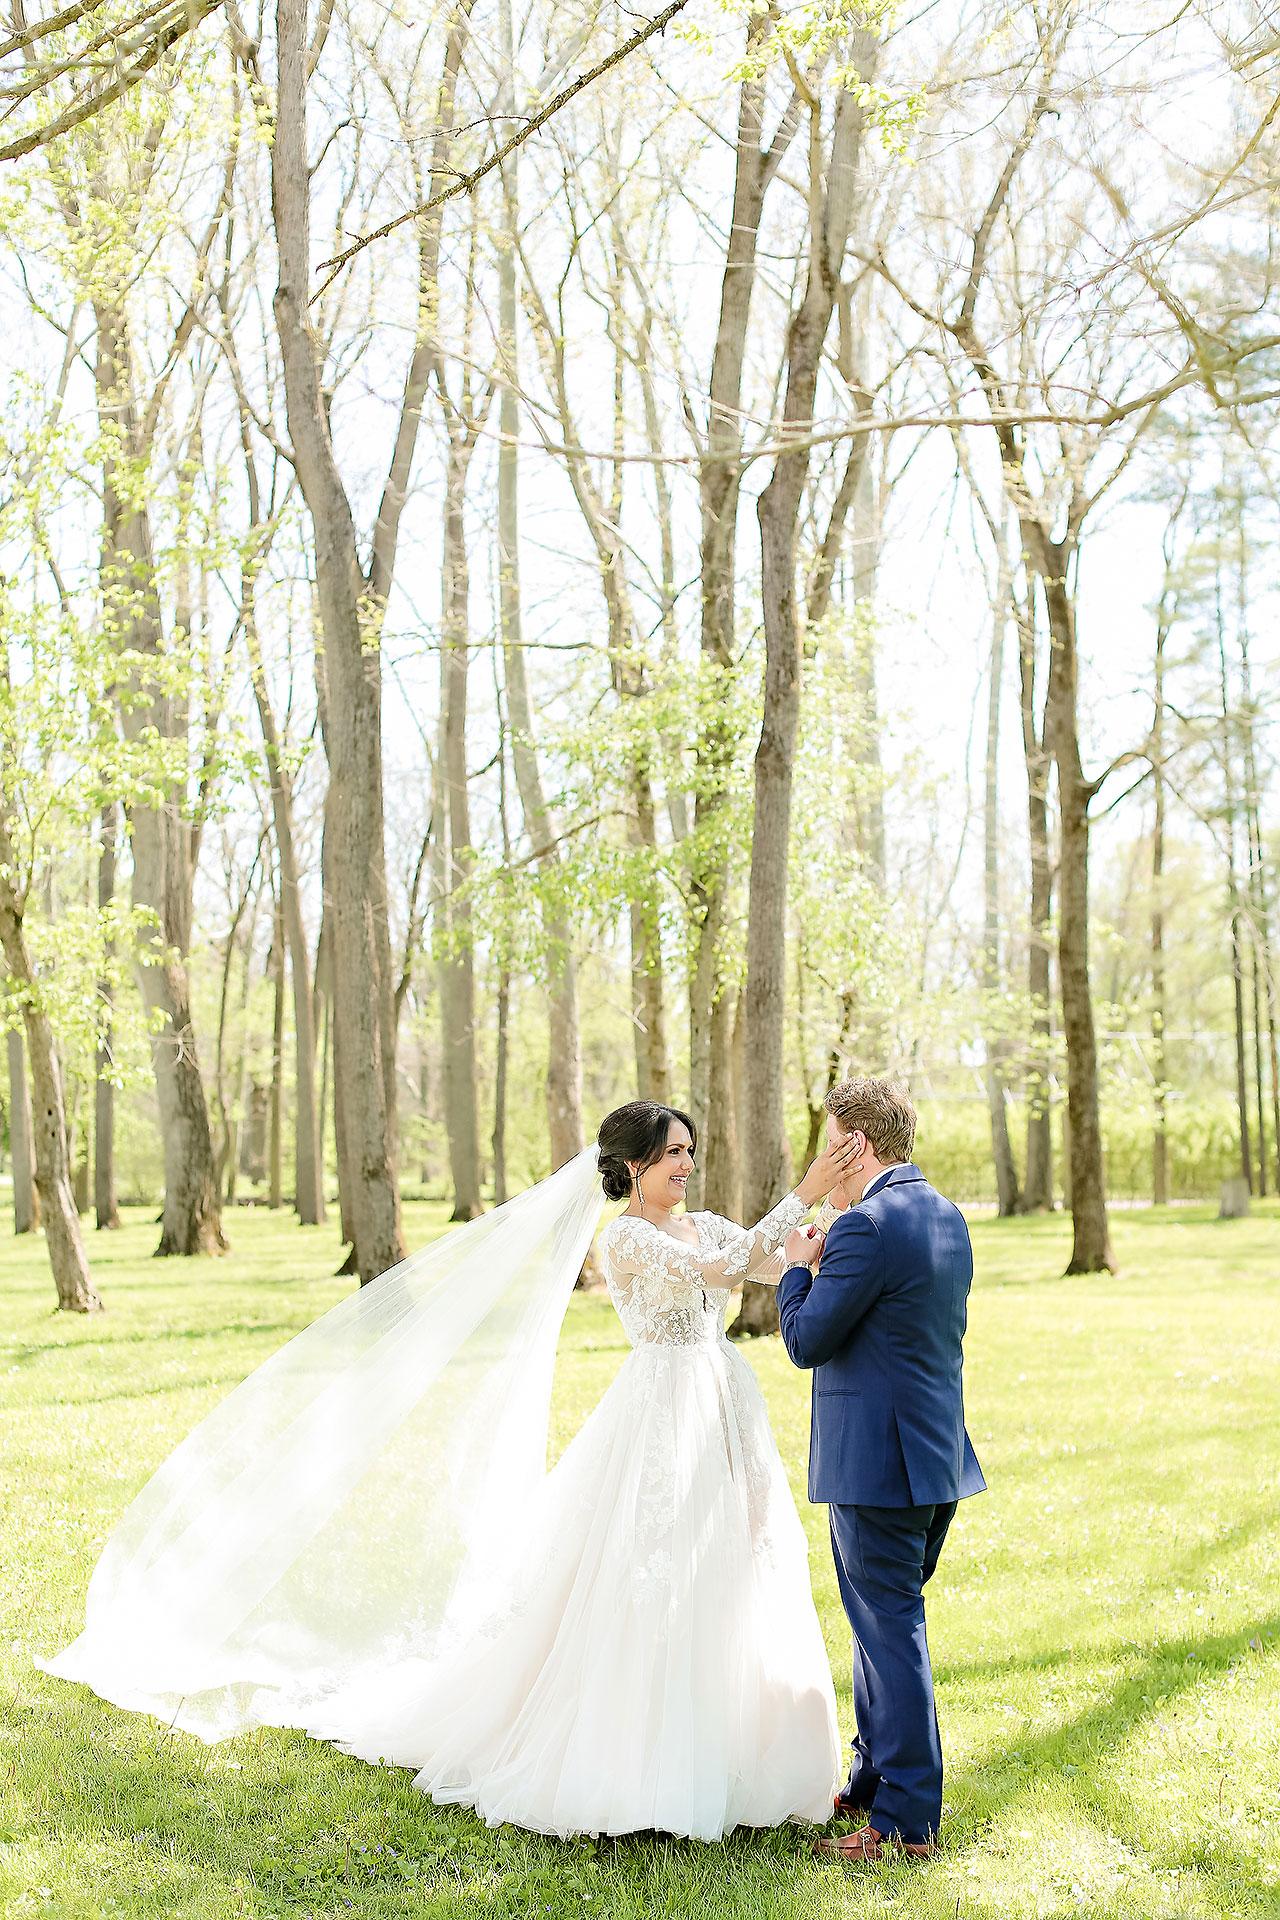 Nadia Parker Black Iris Estate Carmel Indiana Wedding May 2021 053